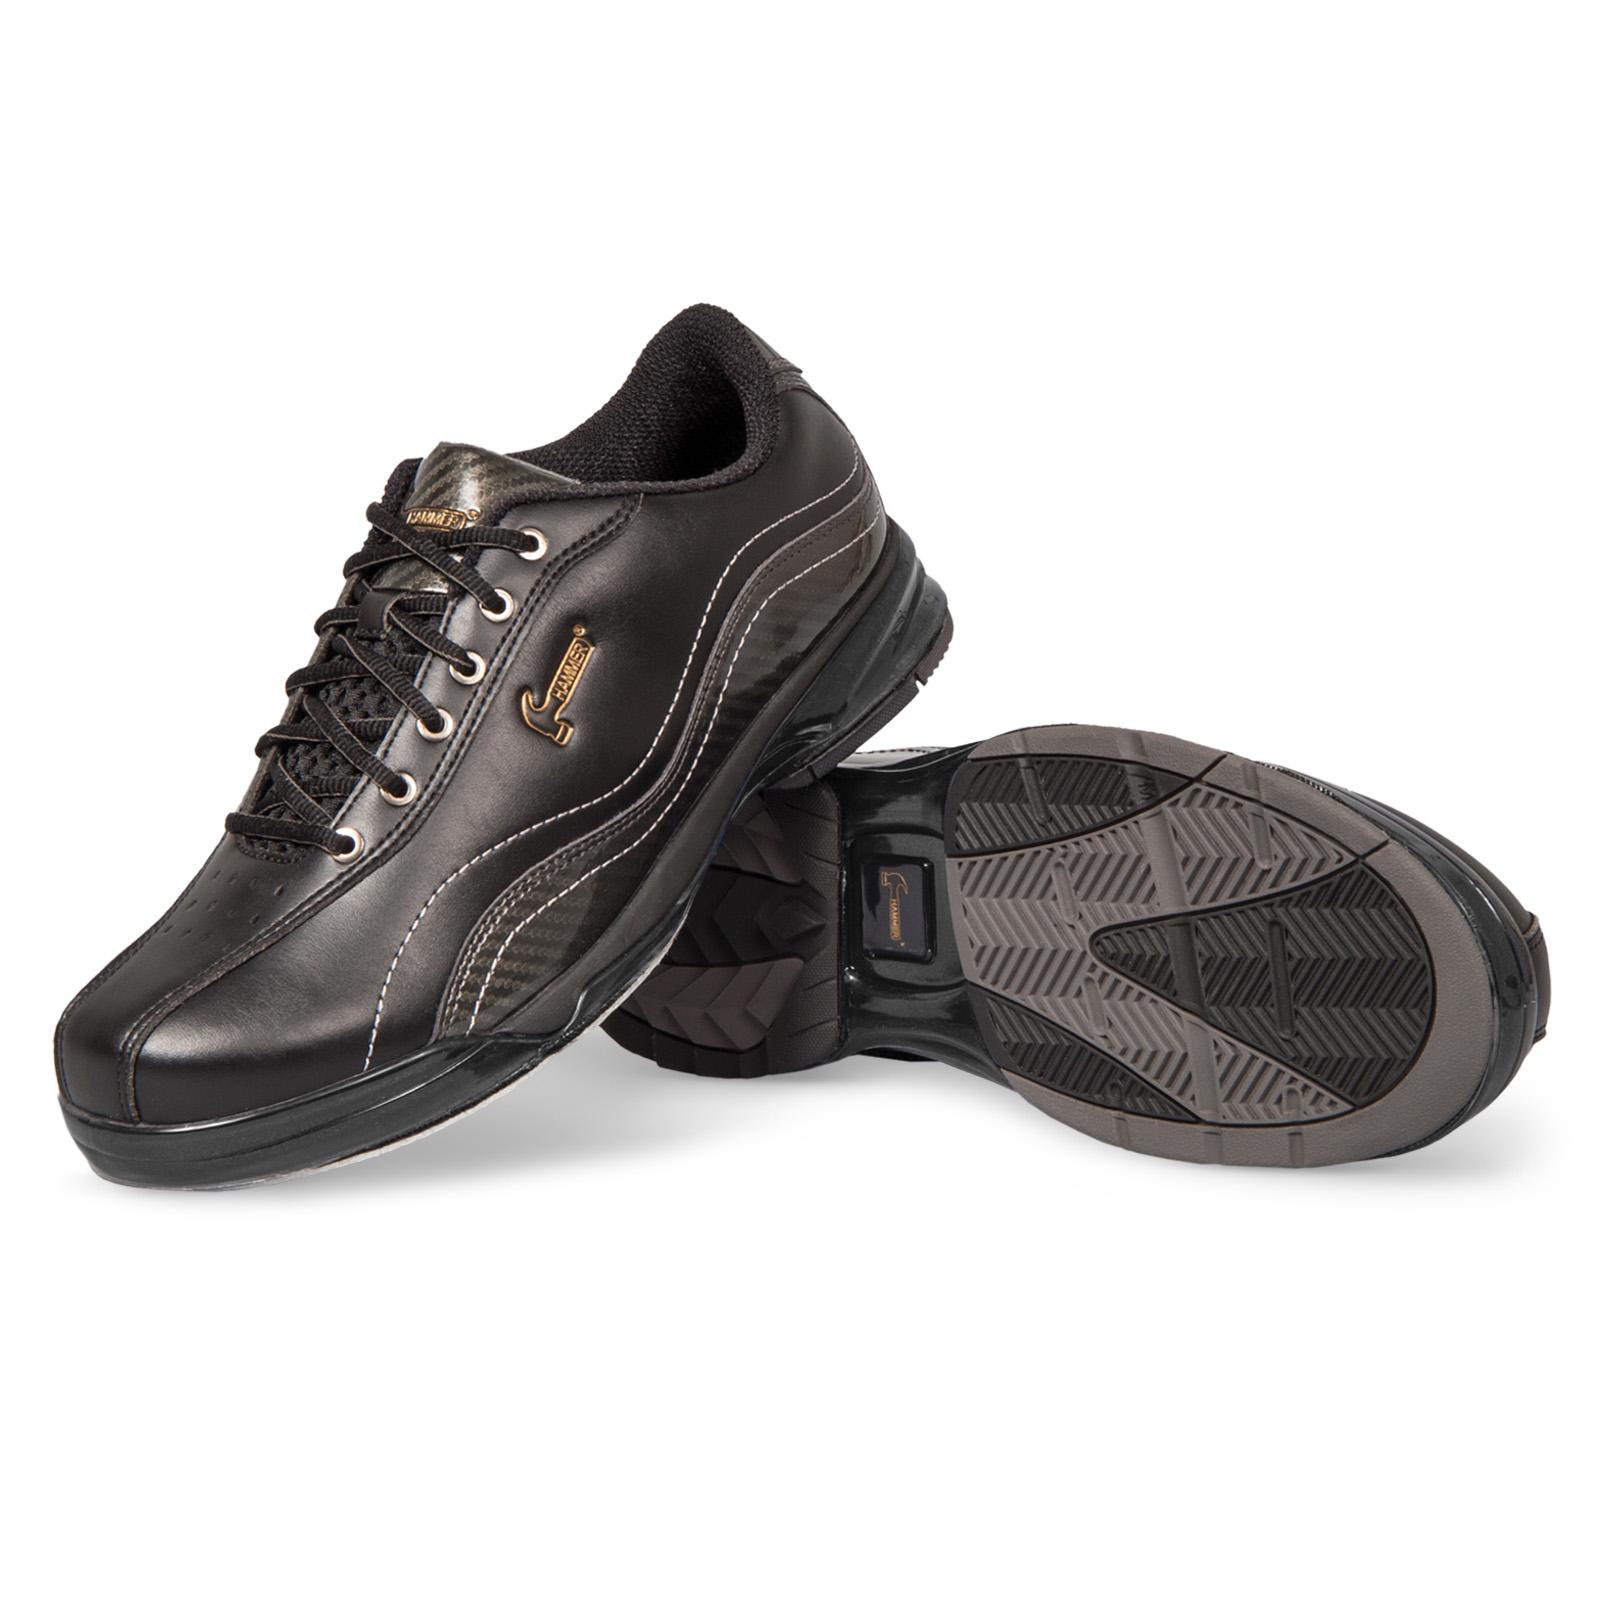 Bowling Shoes Mens Size